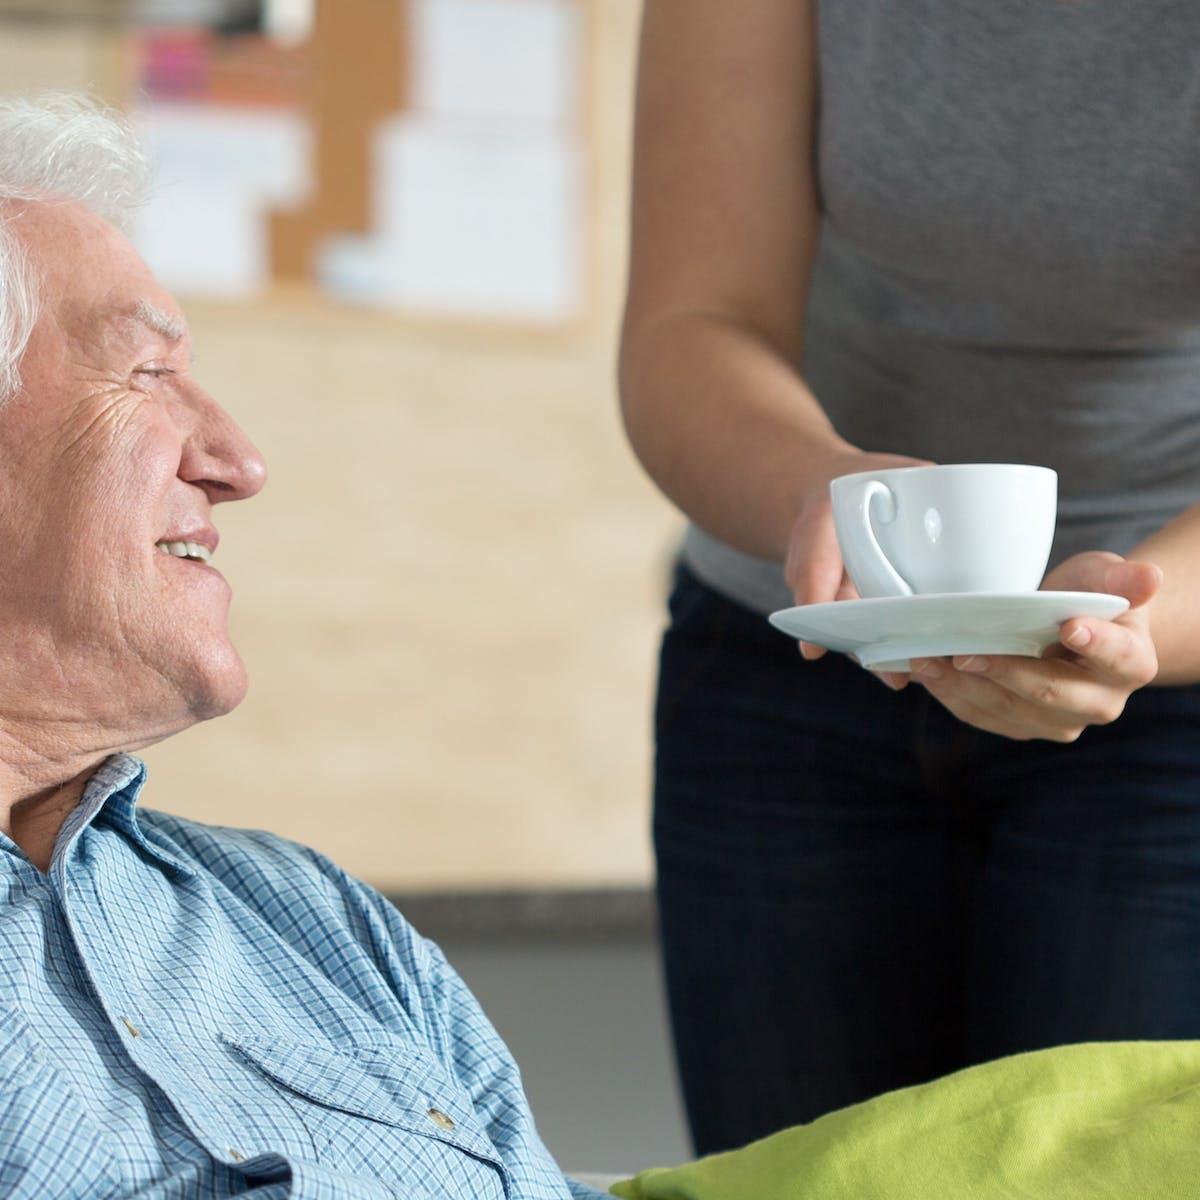 How robots could help bridge the elder-care gap